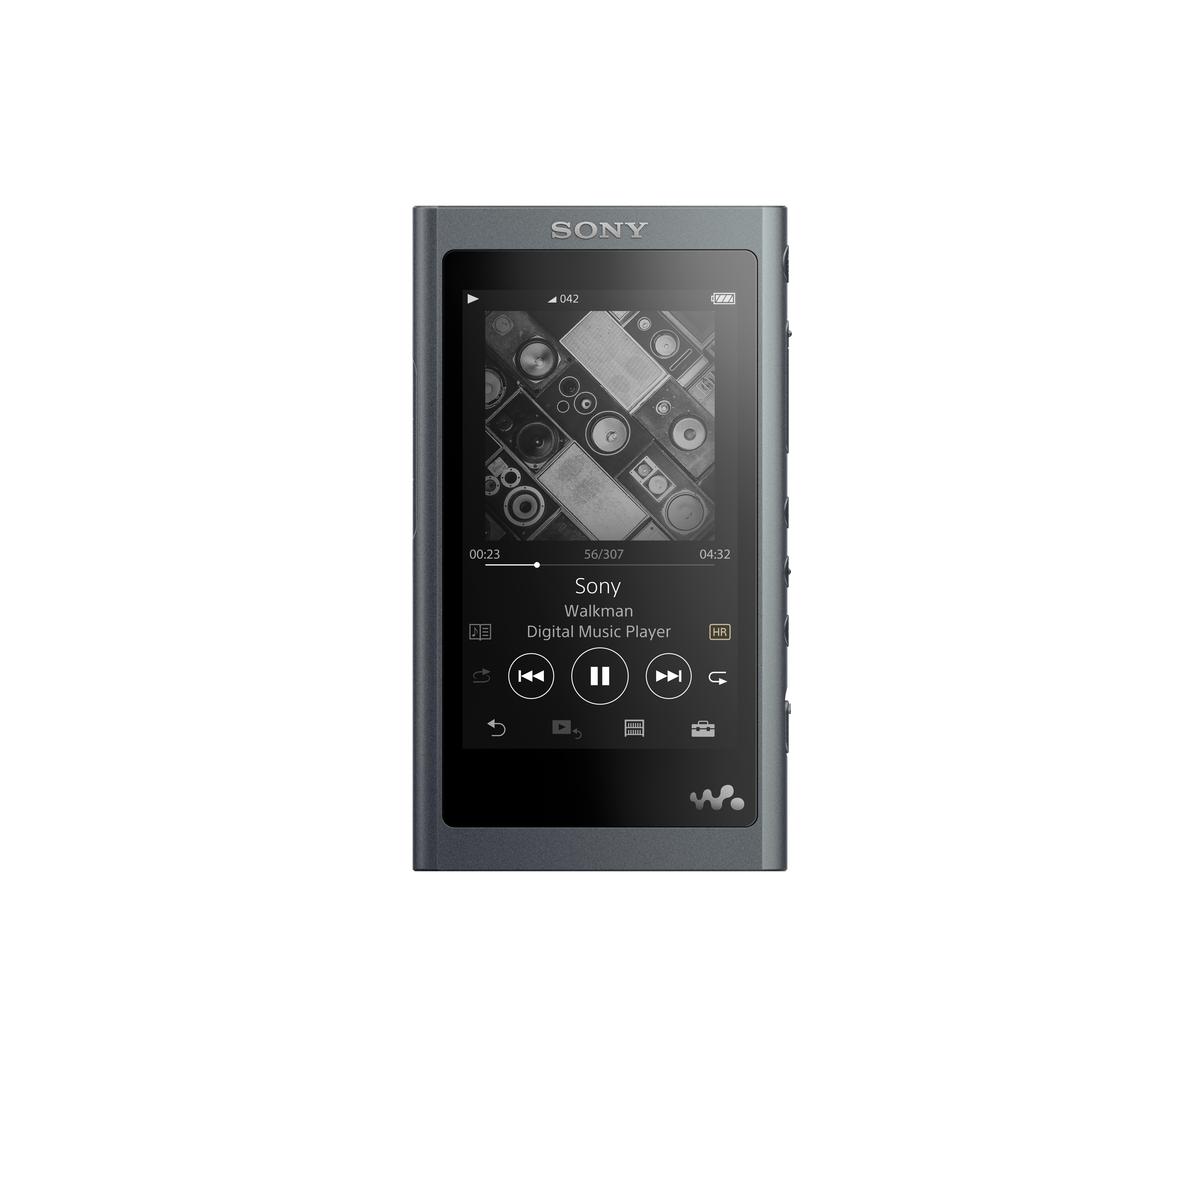 NW-A55B Hi-Res плеер Sony Walkman, 16Gb, цвет черный